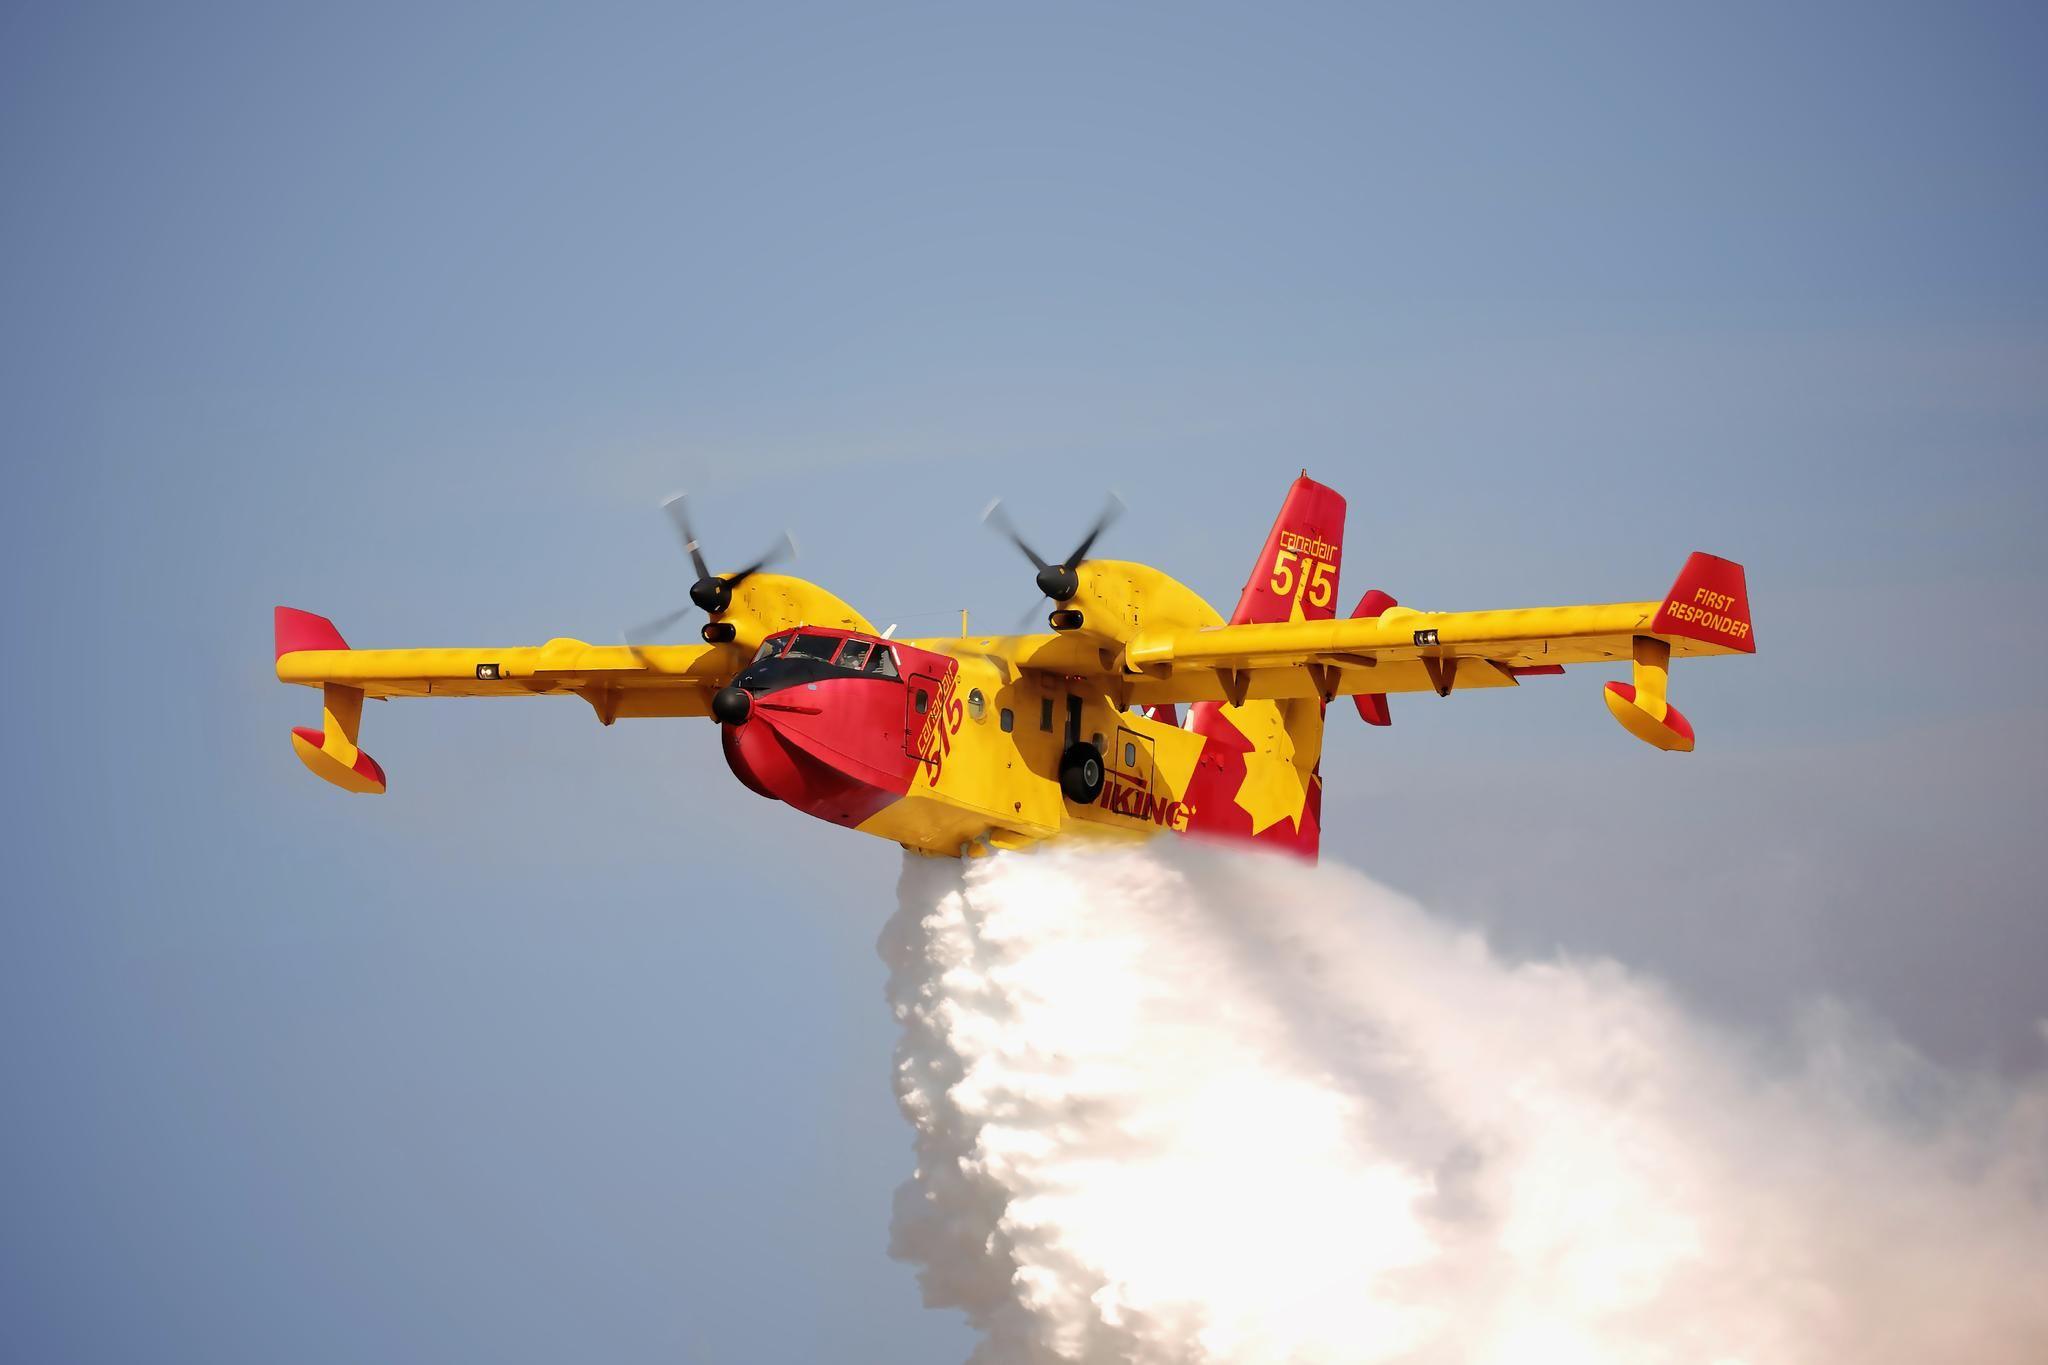 Viking Air Limited